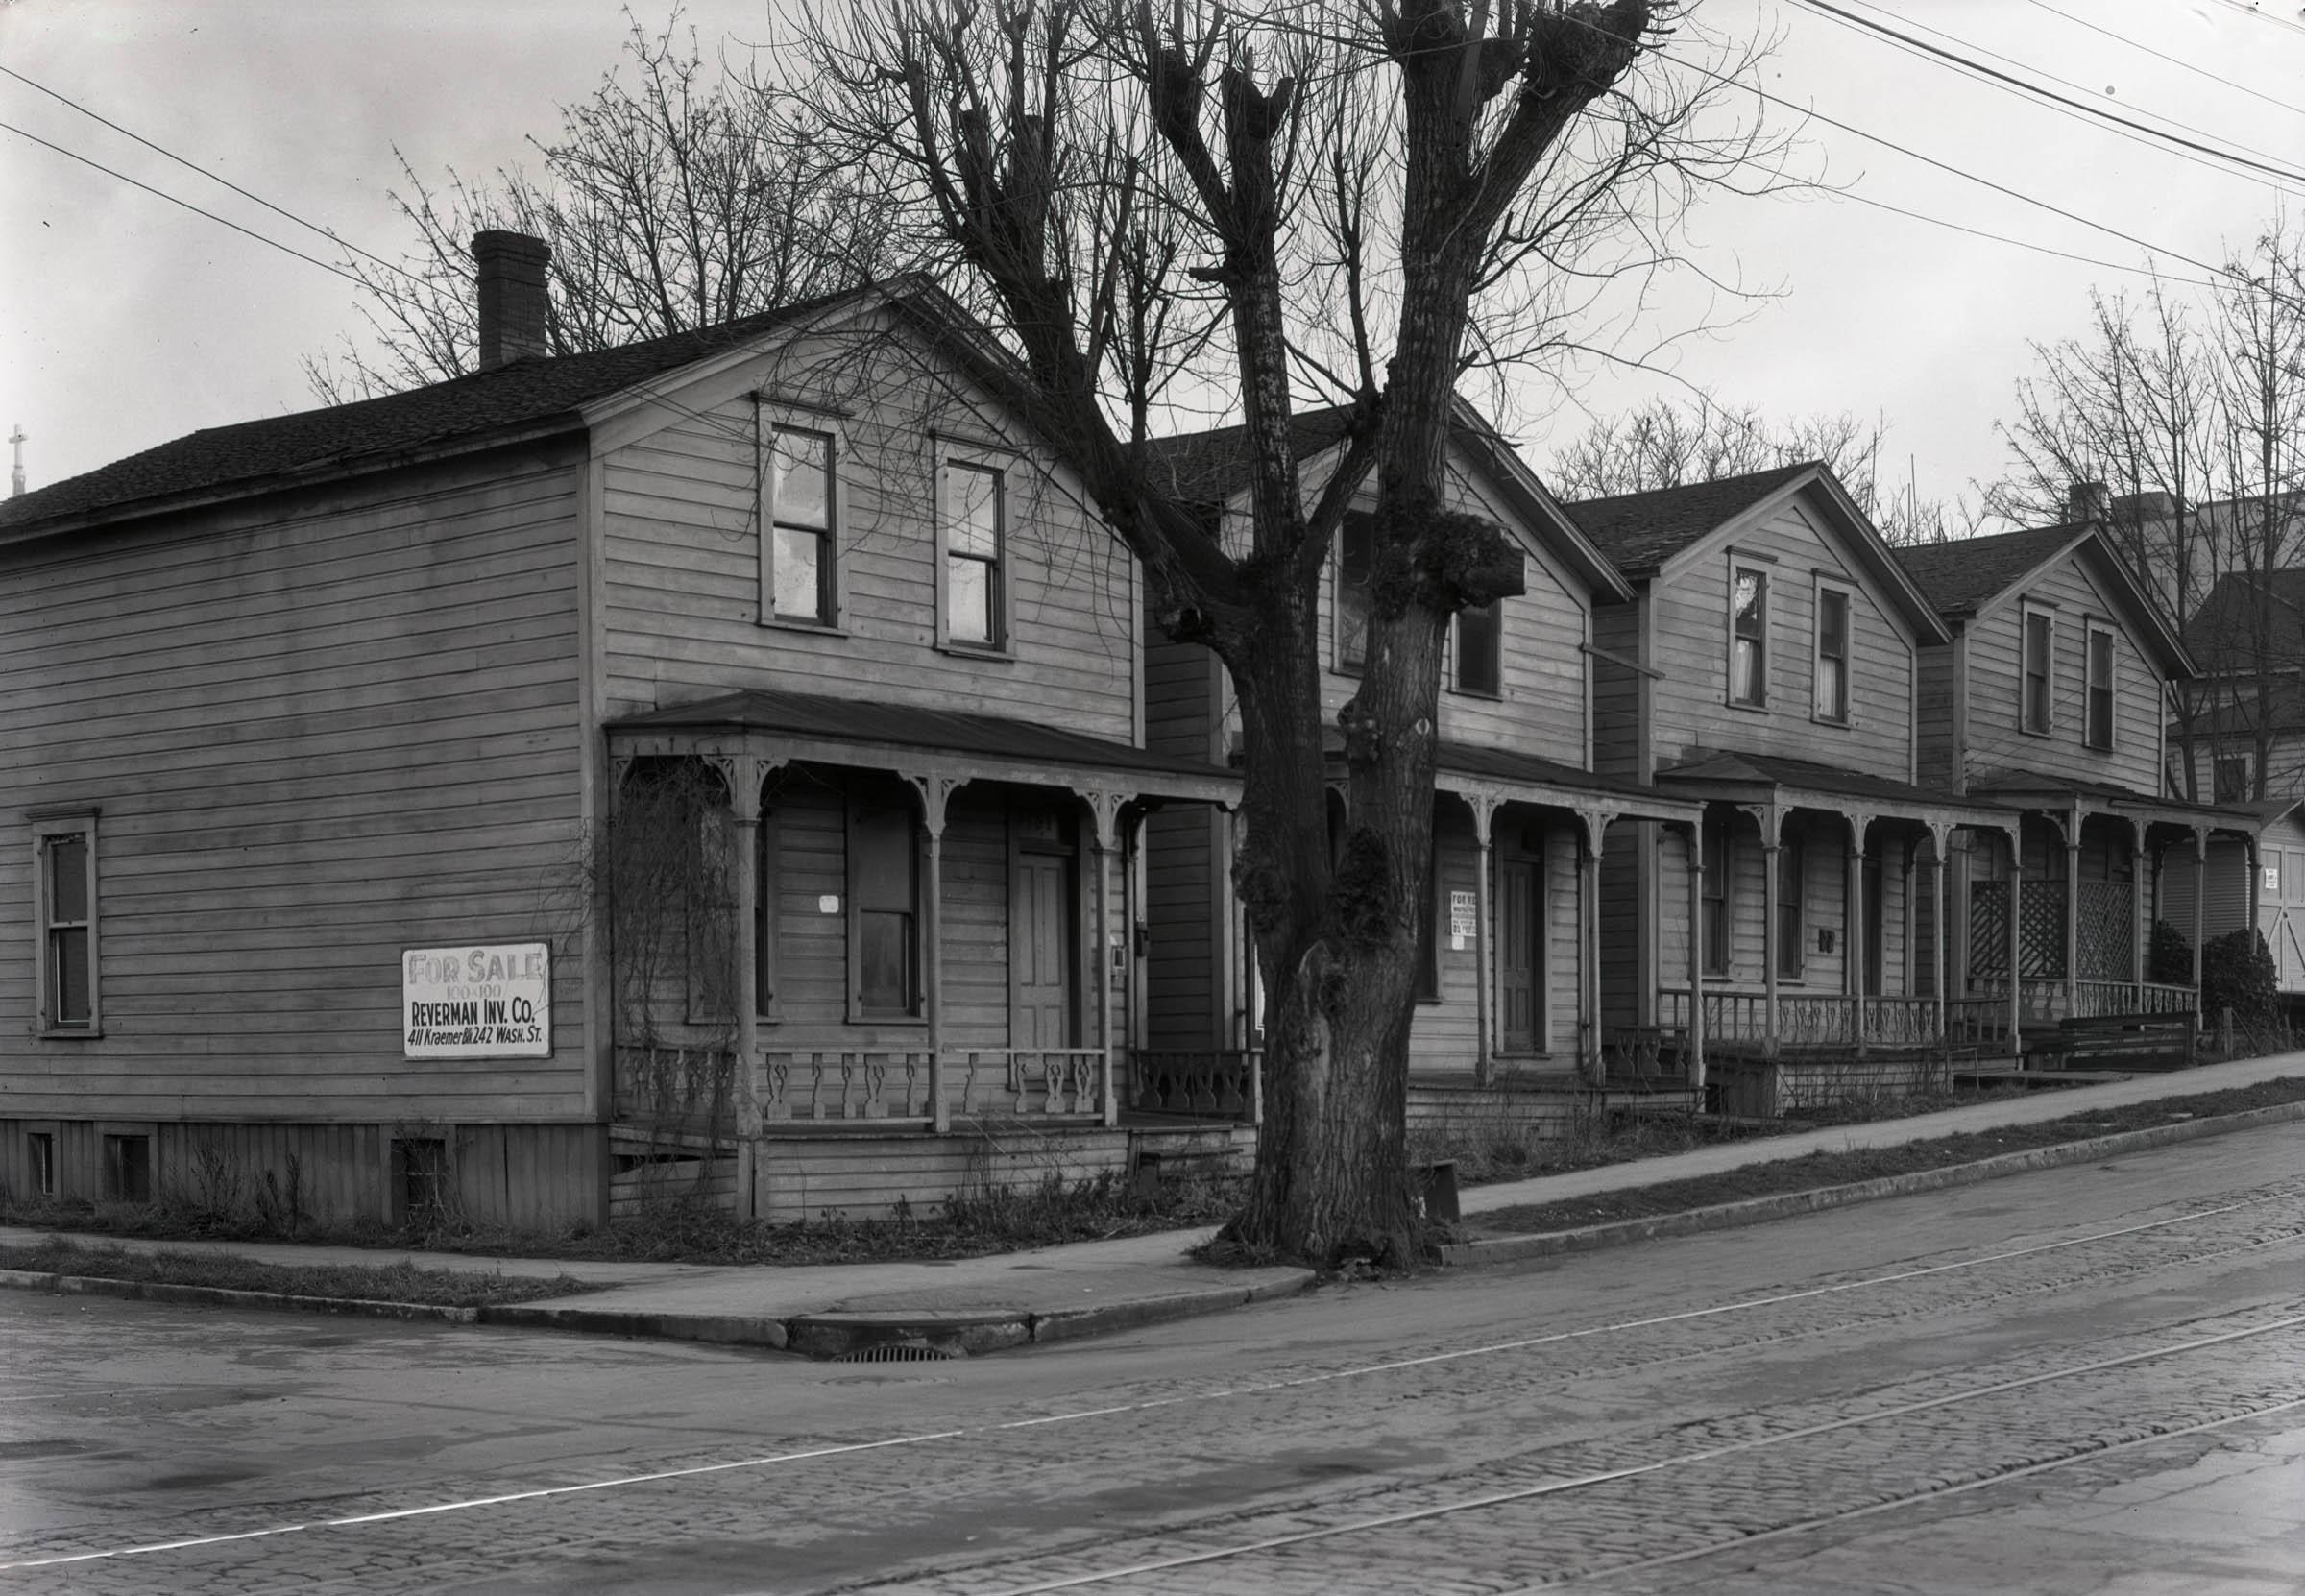 A2009-009.341 Houses for sale on SE Morrison 1929